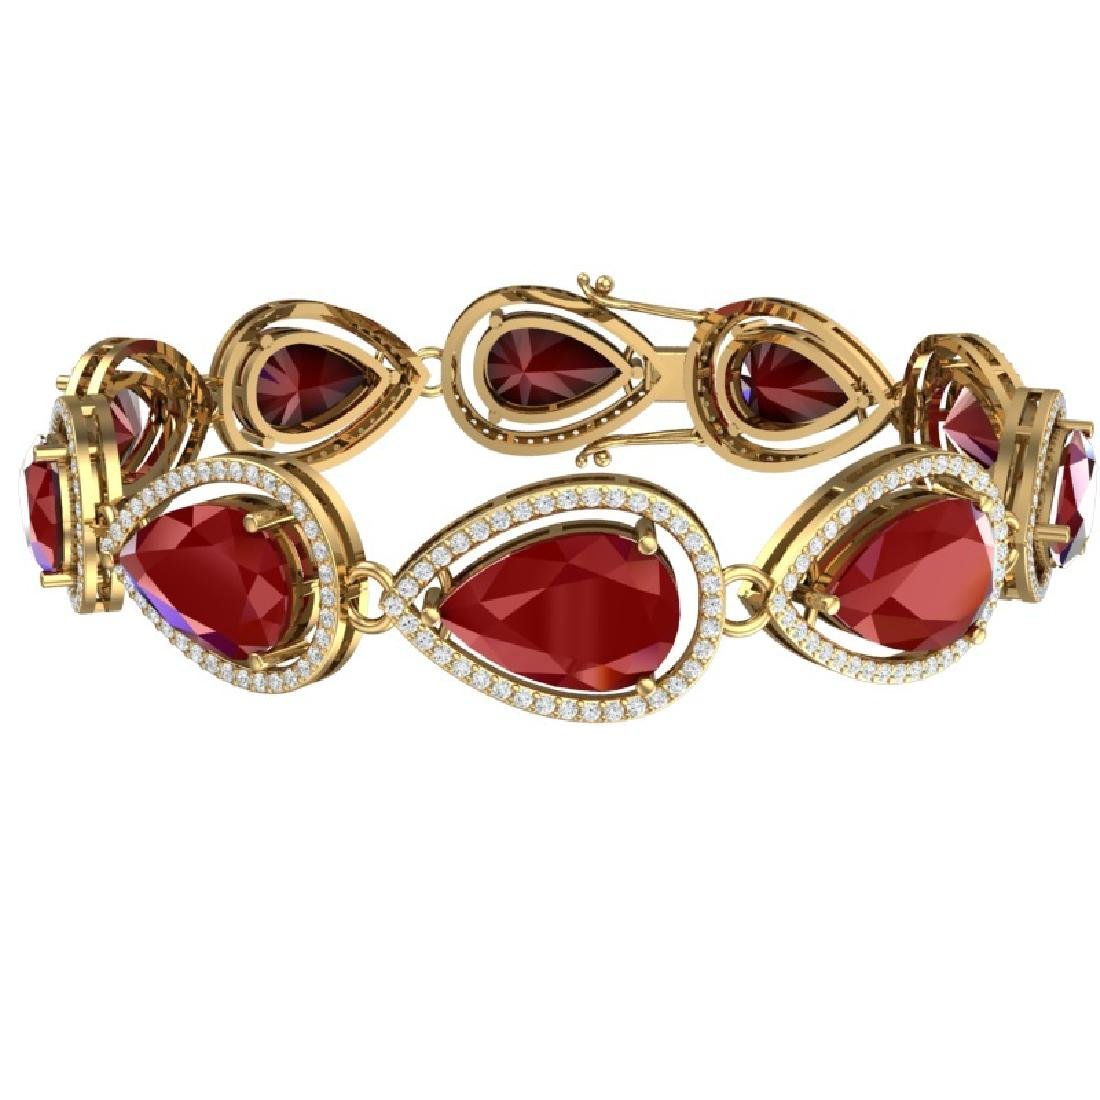 28.31 CTW Royalty Ruby & VS Diamond Bracelet 18K Yellow - 3